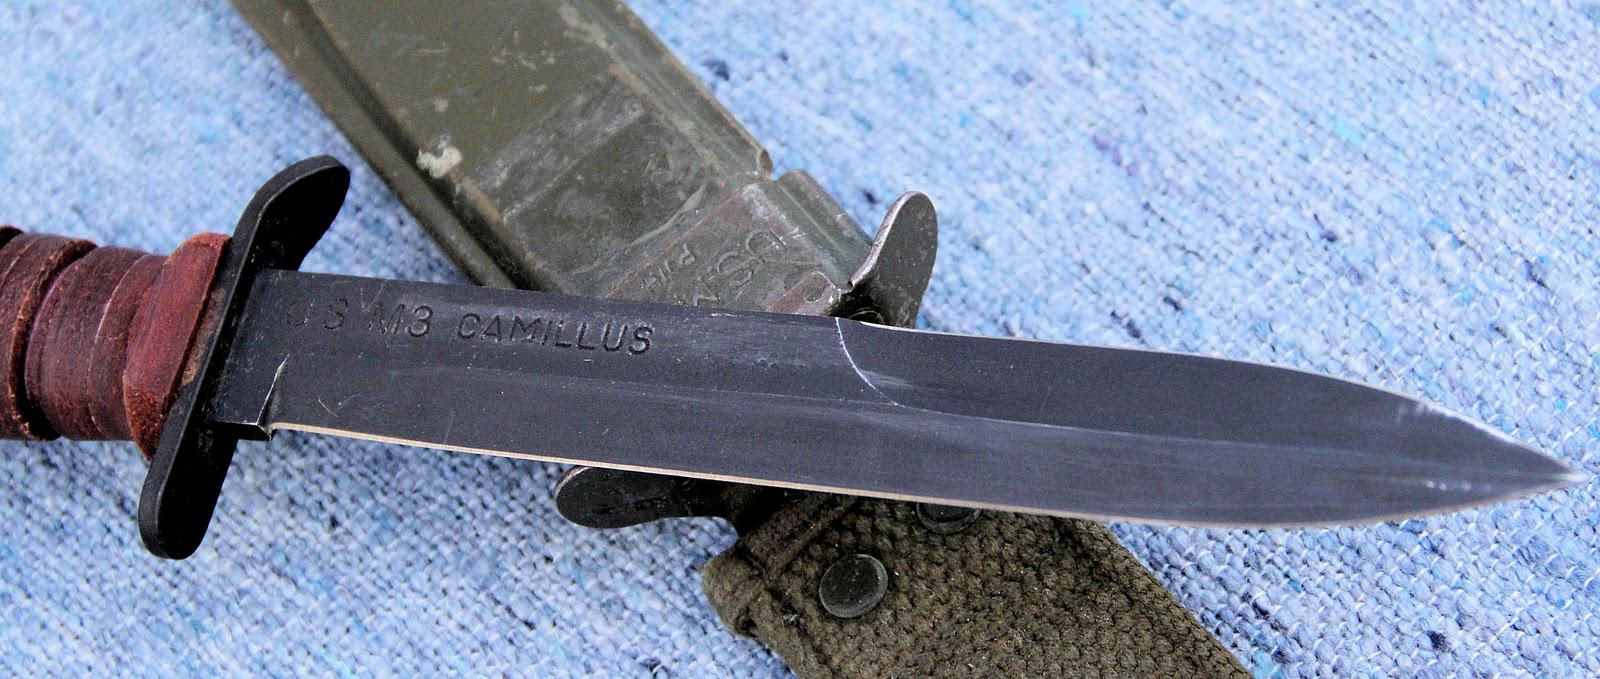 Camillus new york usa marine trench knife dating